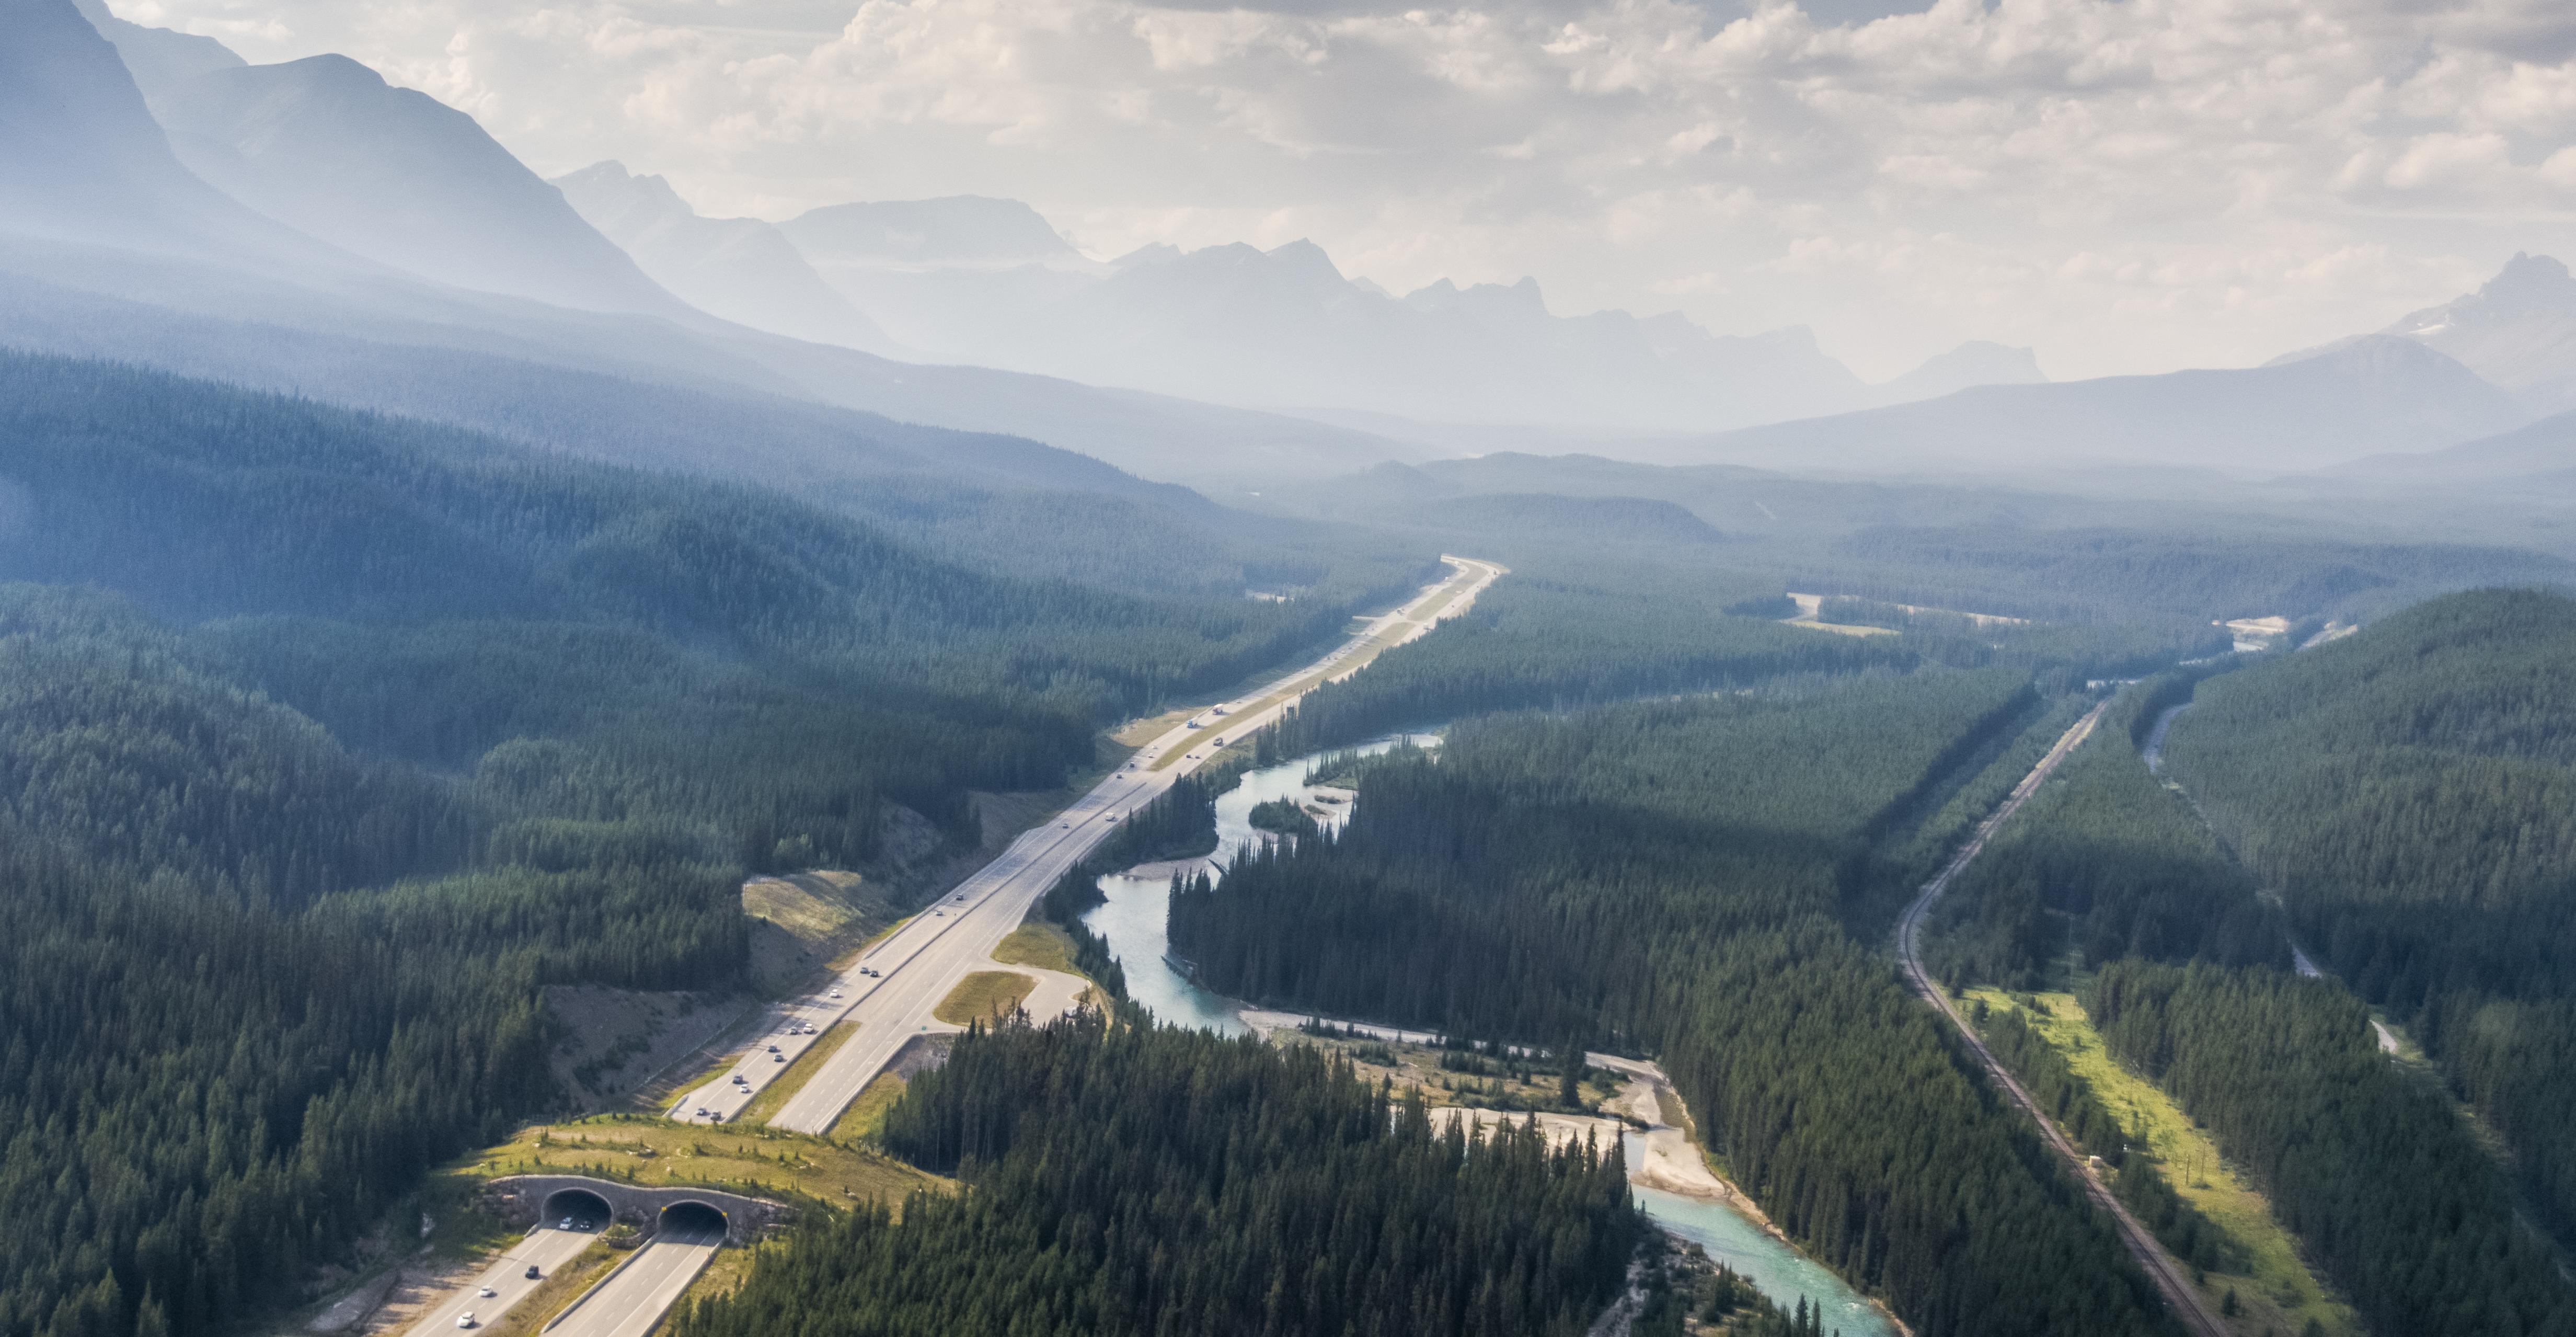 Wildlife overpass, Banff, Canada, Transcanada Highway